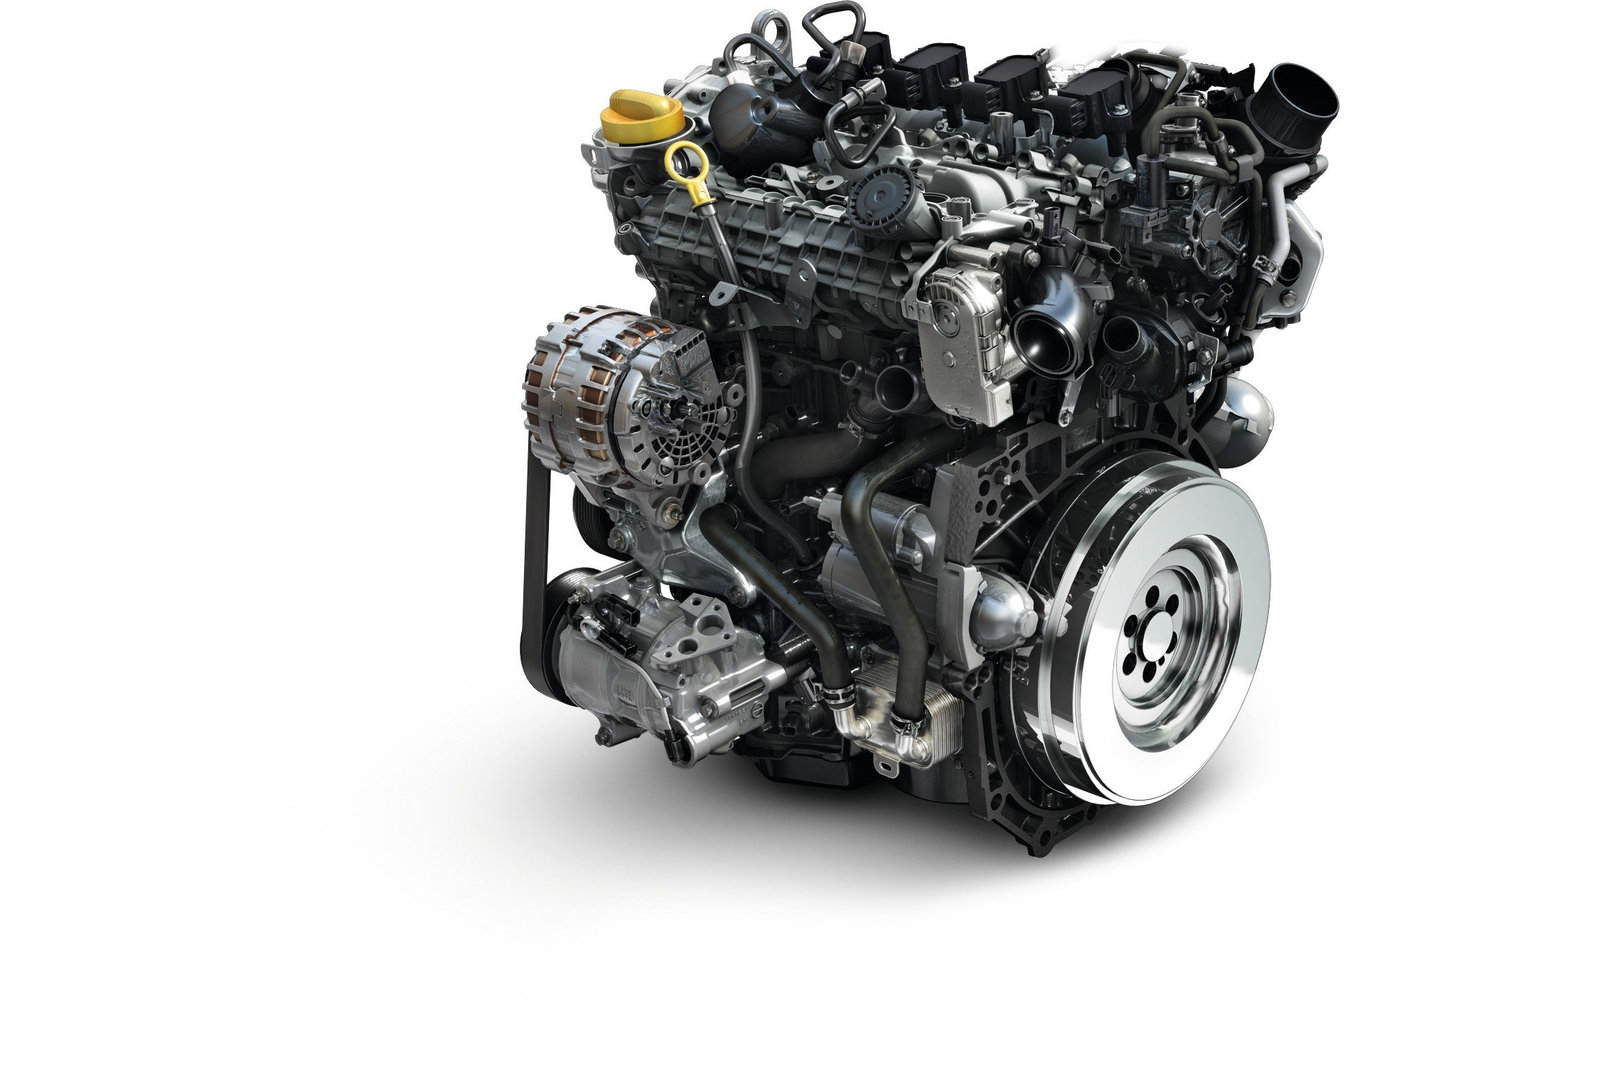 Renault presenta el motor policombustible LGBTTTIQA